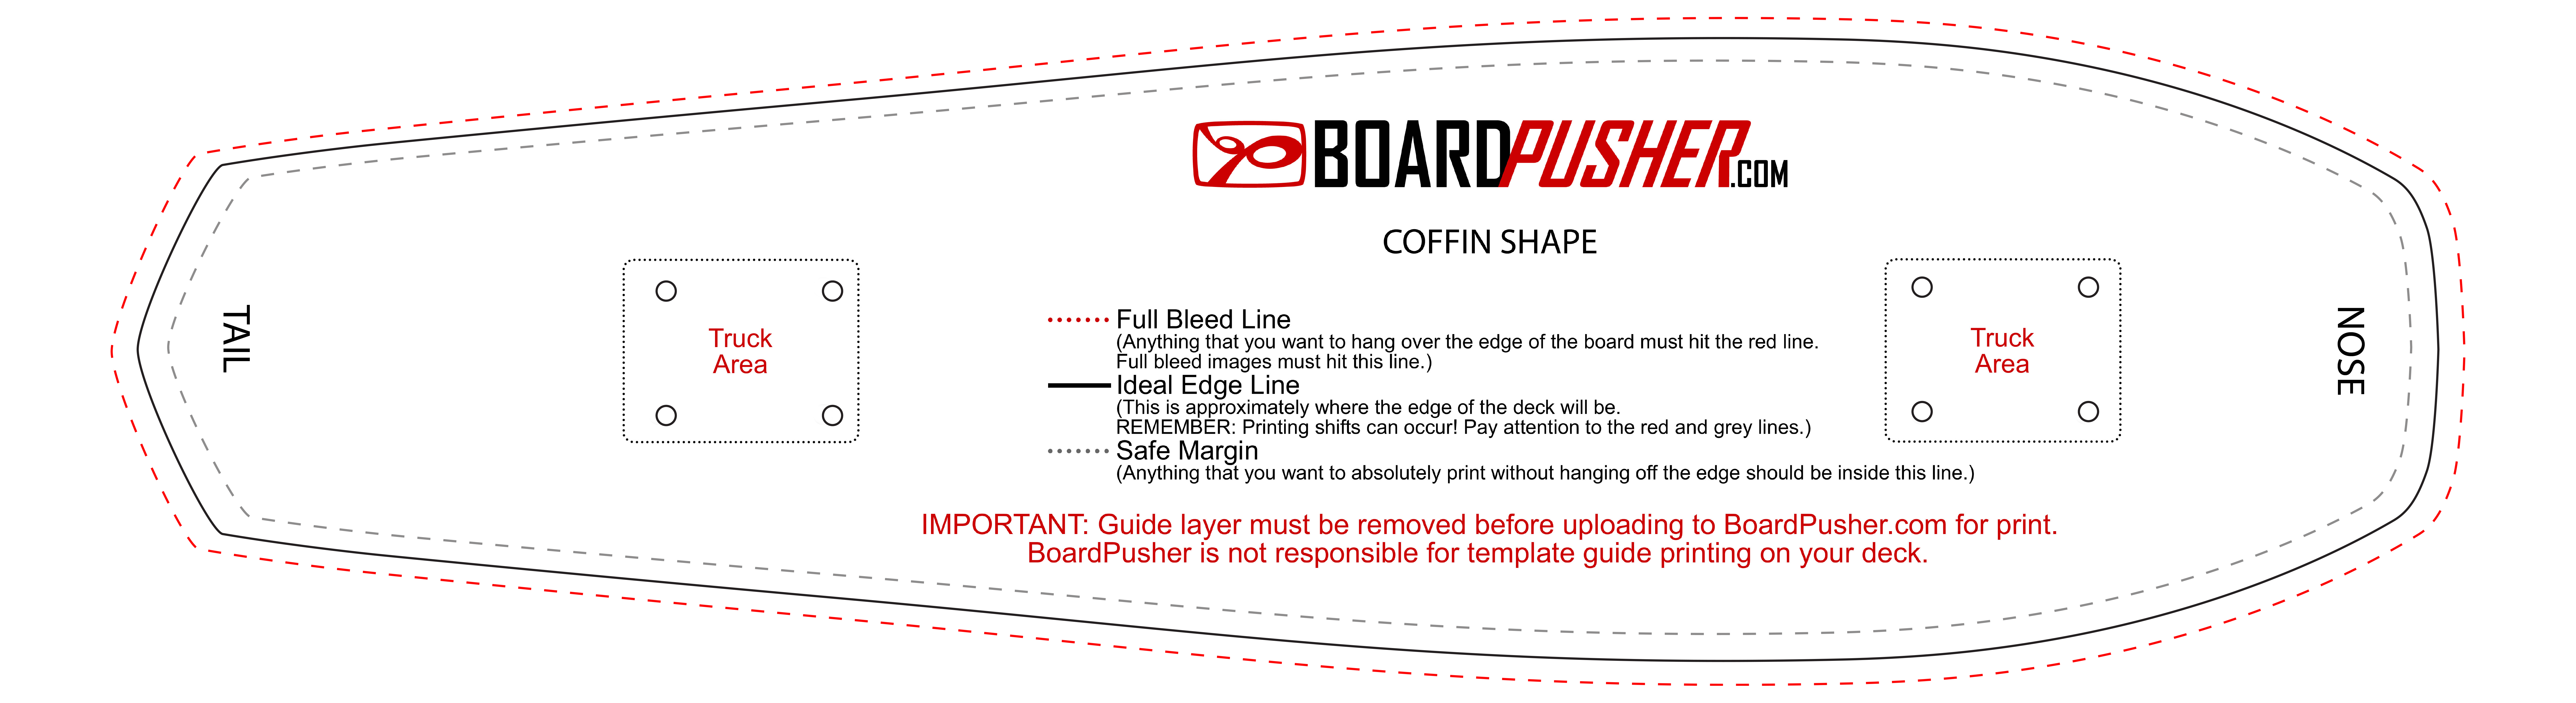 Boardpusher help design tips design your own skateboard coffin 150 dpi 300 dpi pronofoot35fo Choice Image